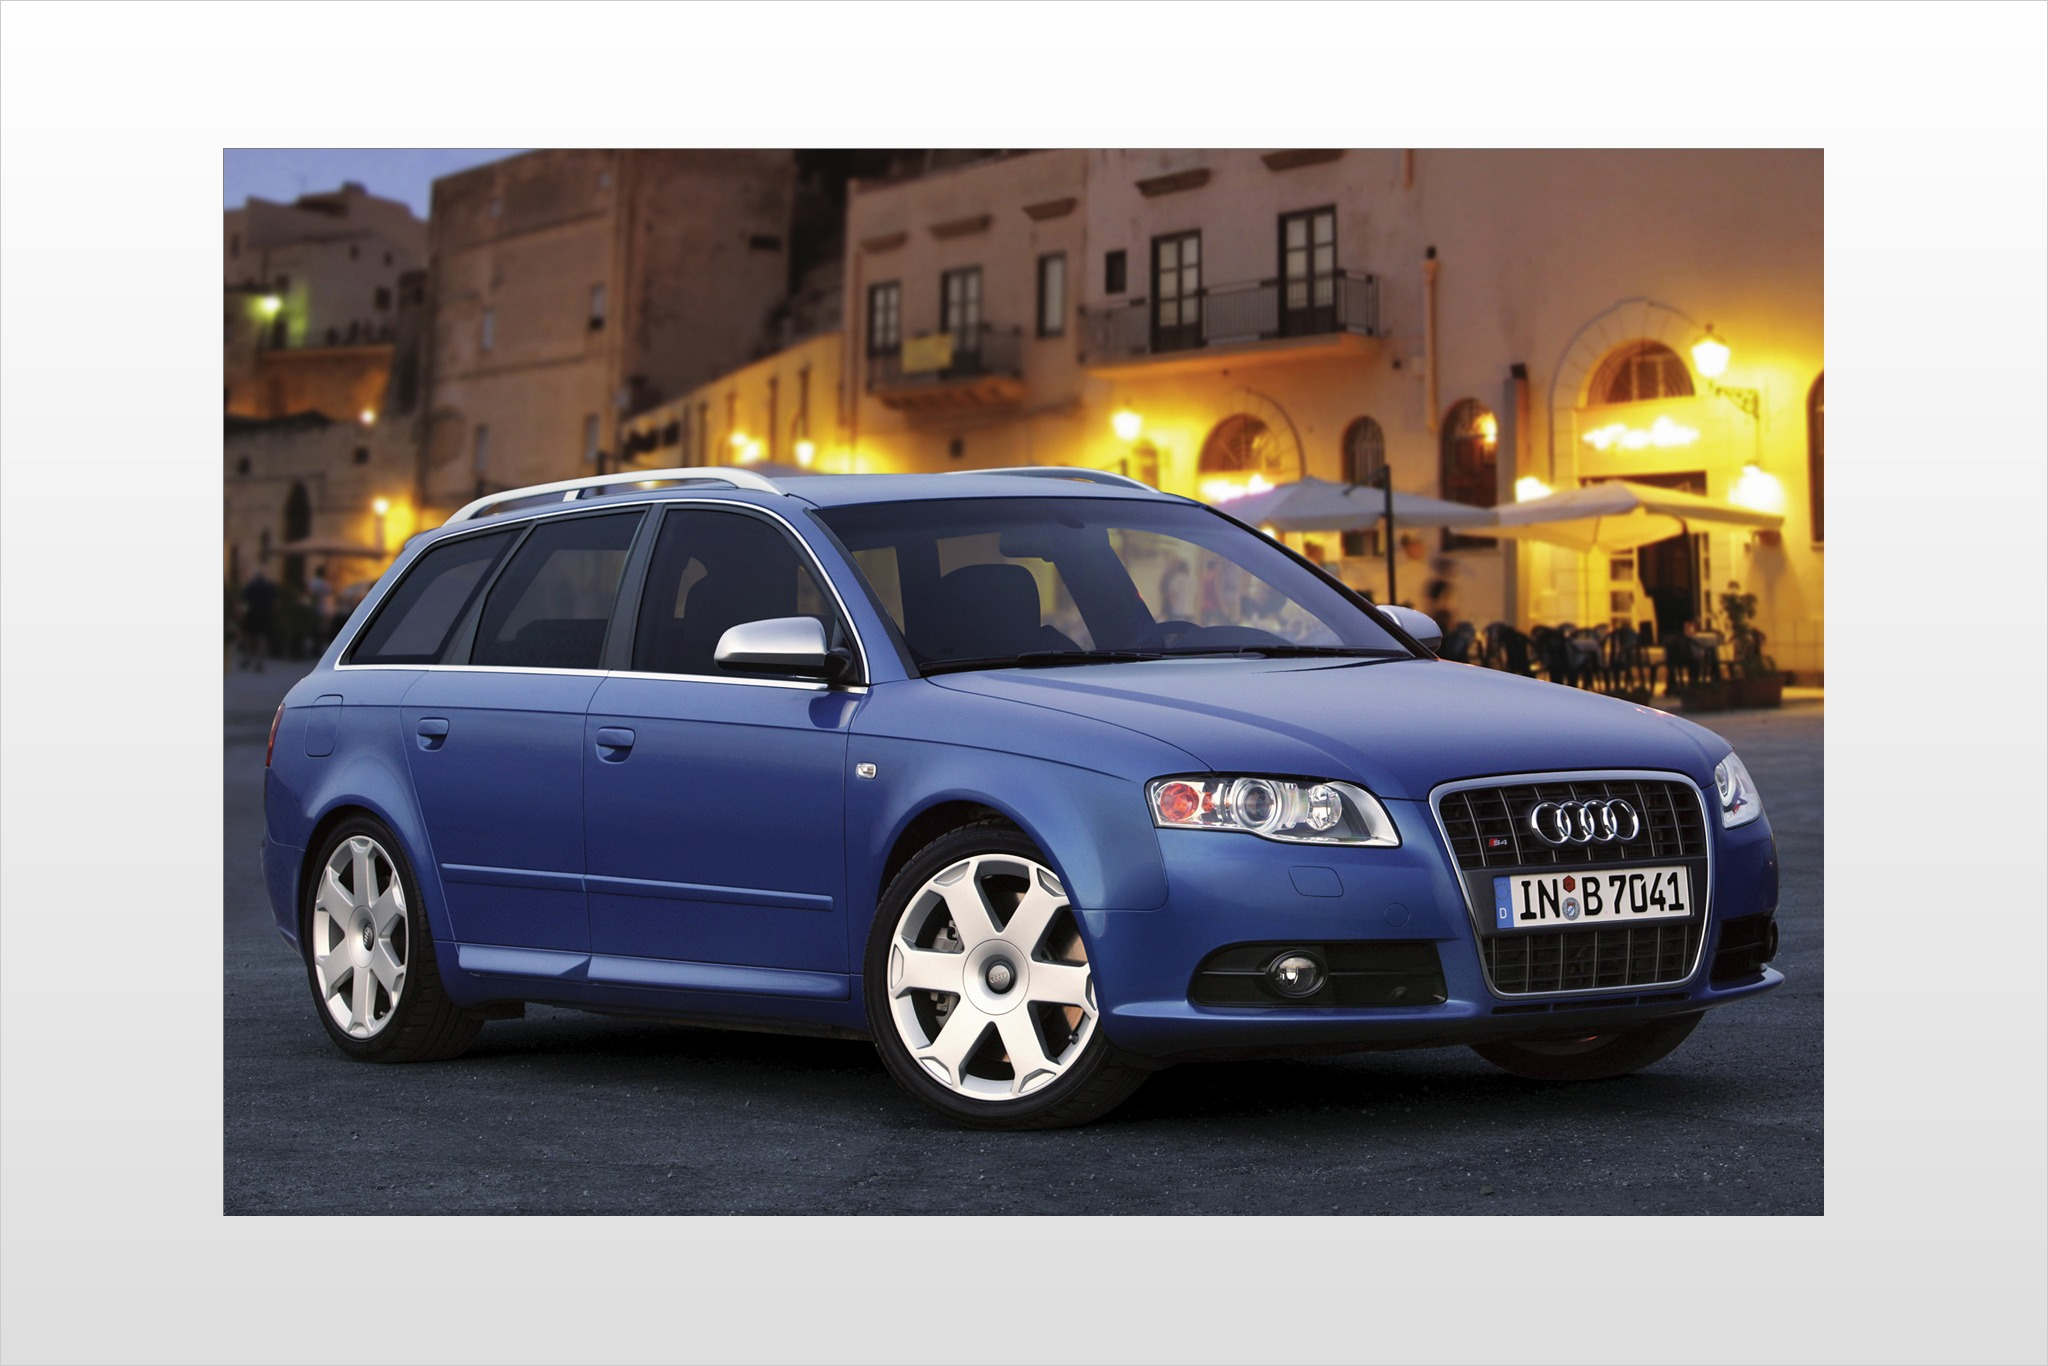 2008 Audi S4 Image 5